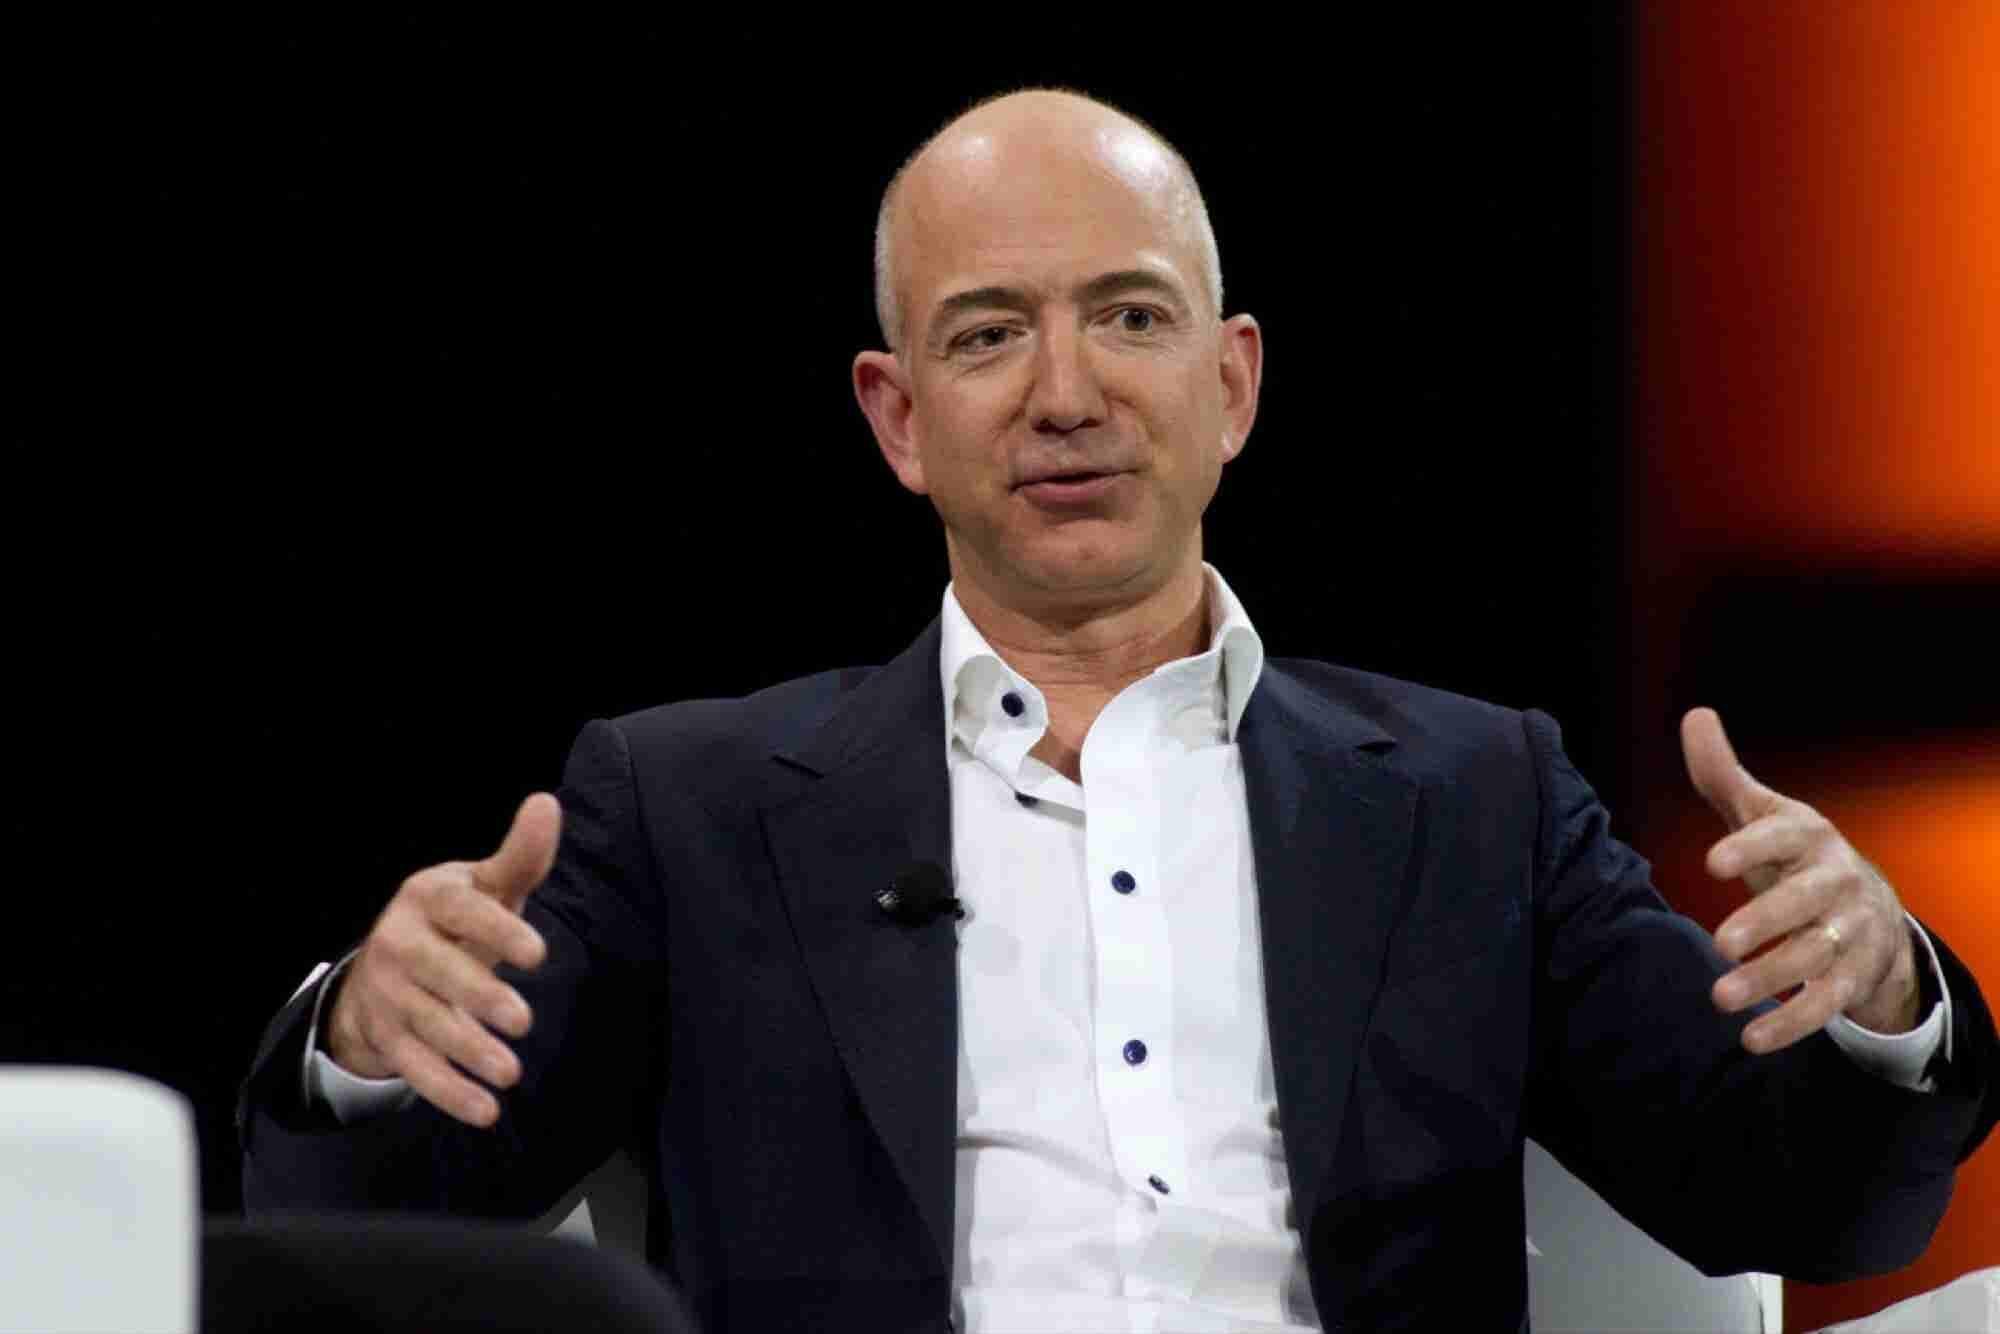 Jeff Bezos's Space Startup Blue Origin Soars Into the Reusable Rocket Race